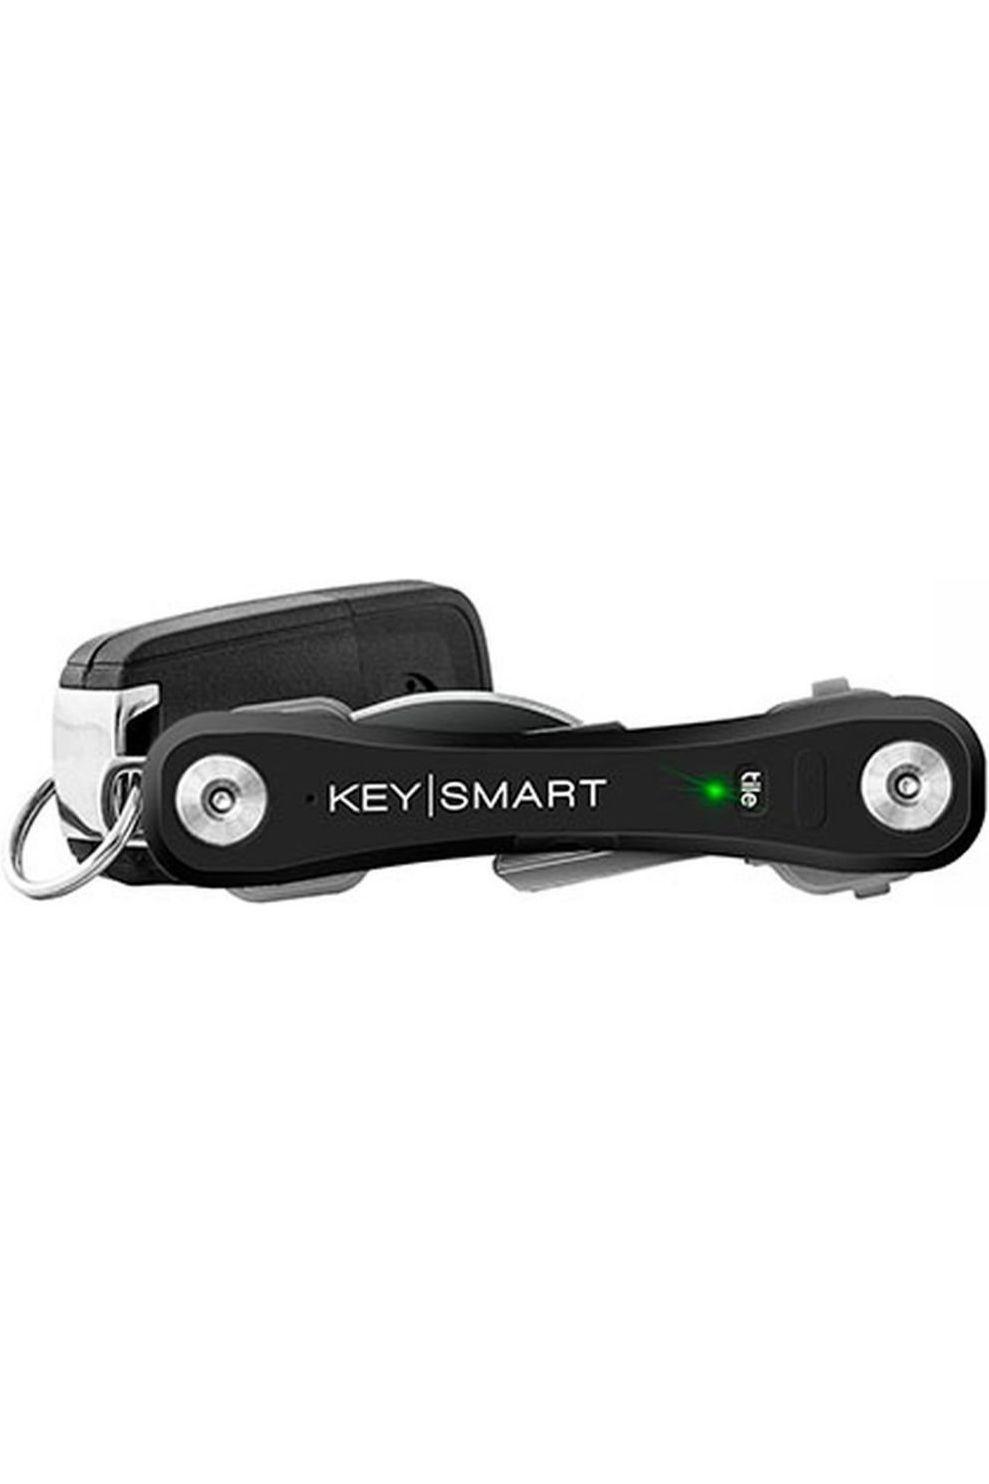 Keysmart Sleutelhouder Pro With Tile Smart - Zwart